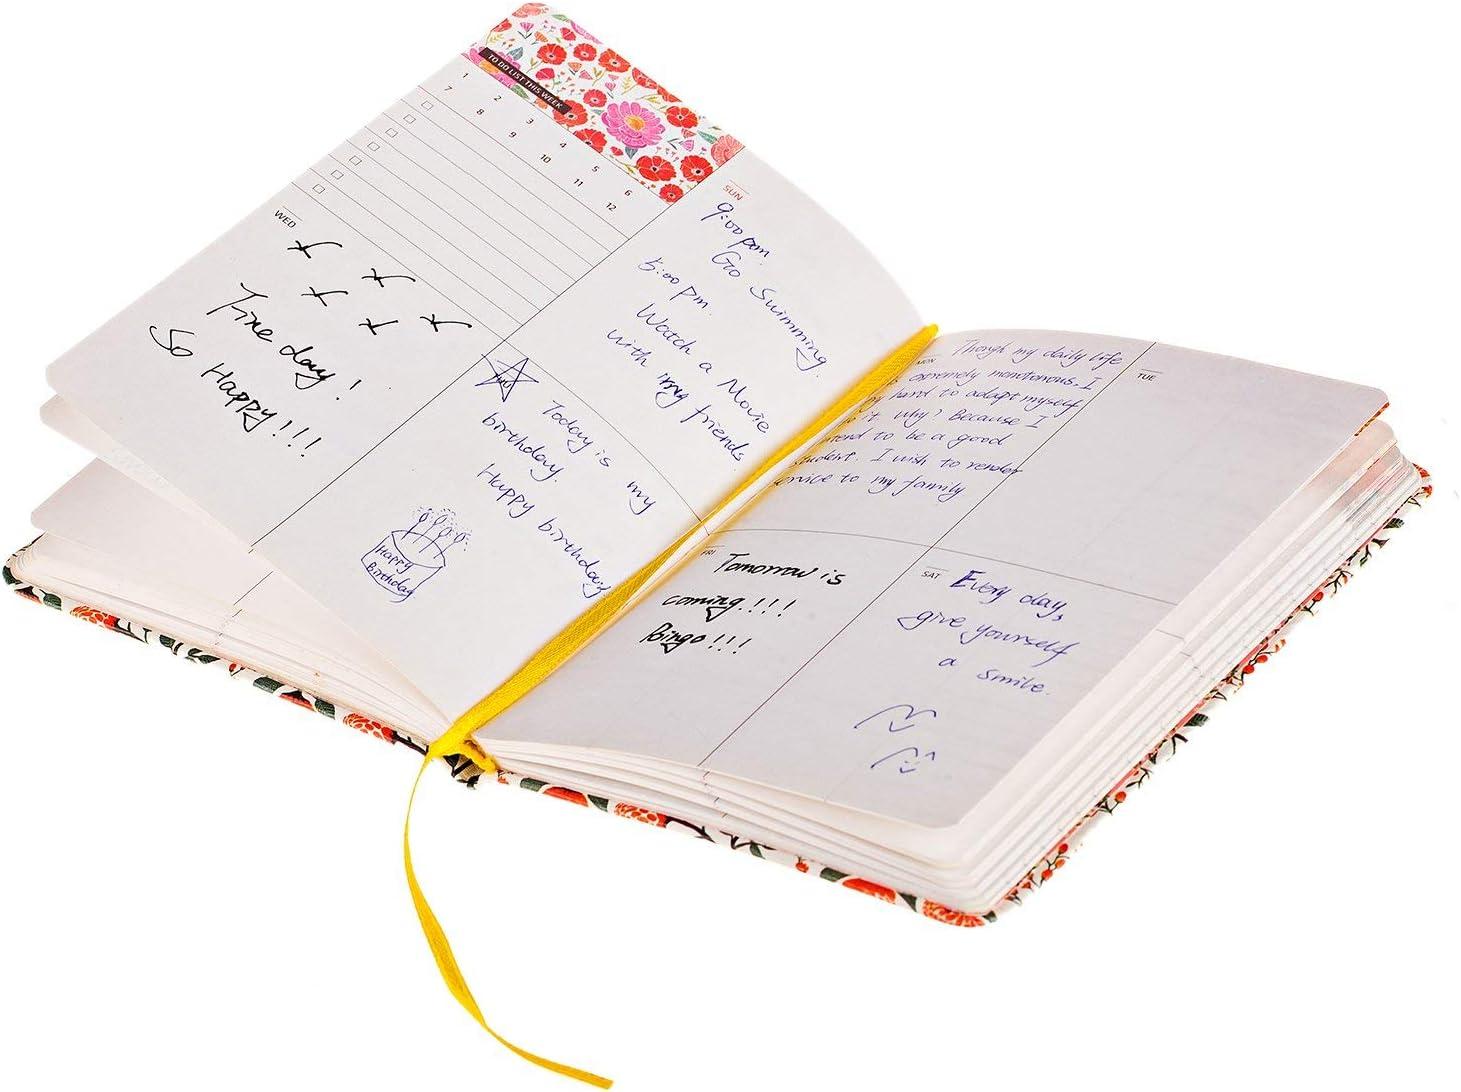 AidShunN Daily Planner Calendar Cuaderno del Diario Programa Semanal Mensual